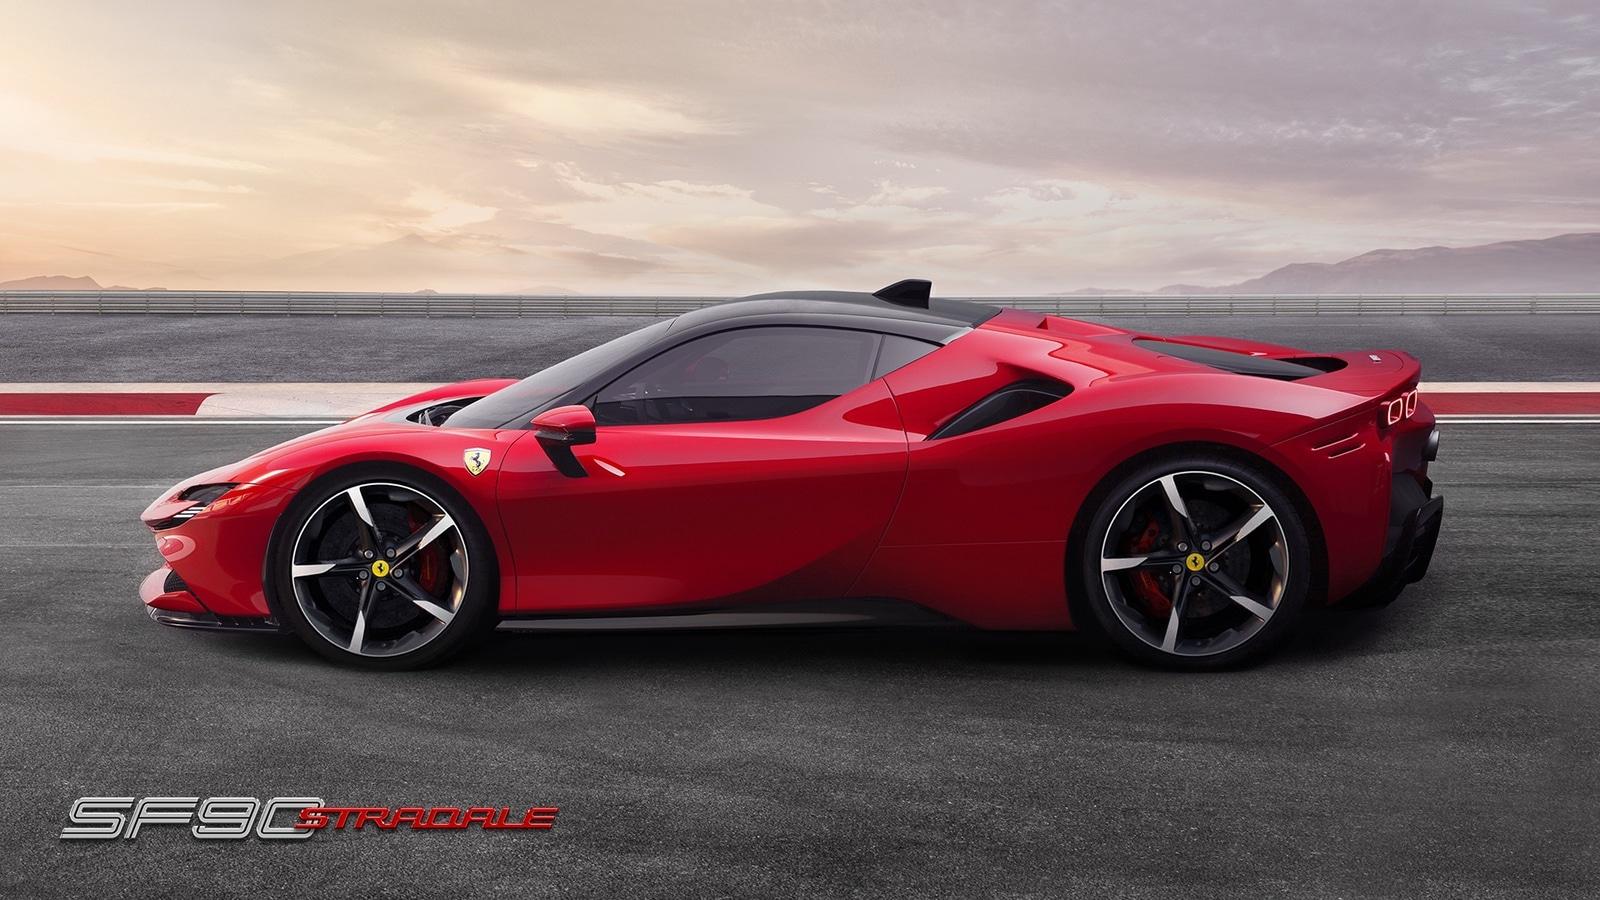 Ferrari SF90 Stradale – 1000 CV Hybrid (0-100 in 2.5 sec) 3